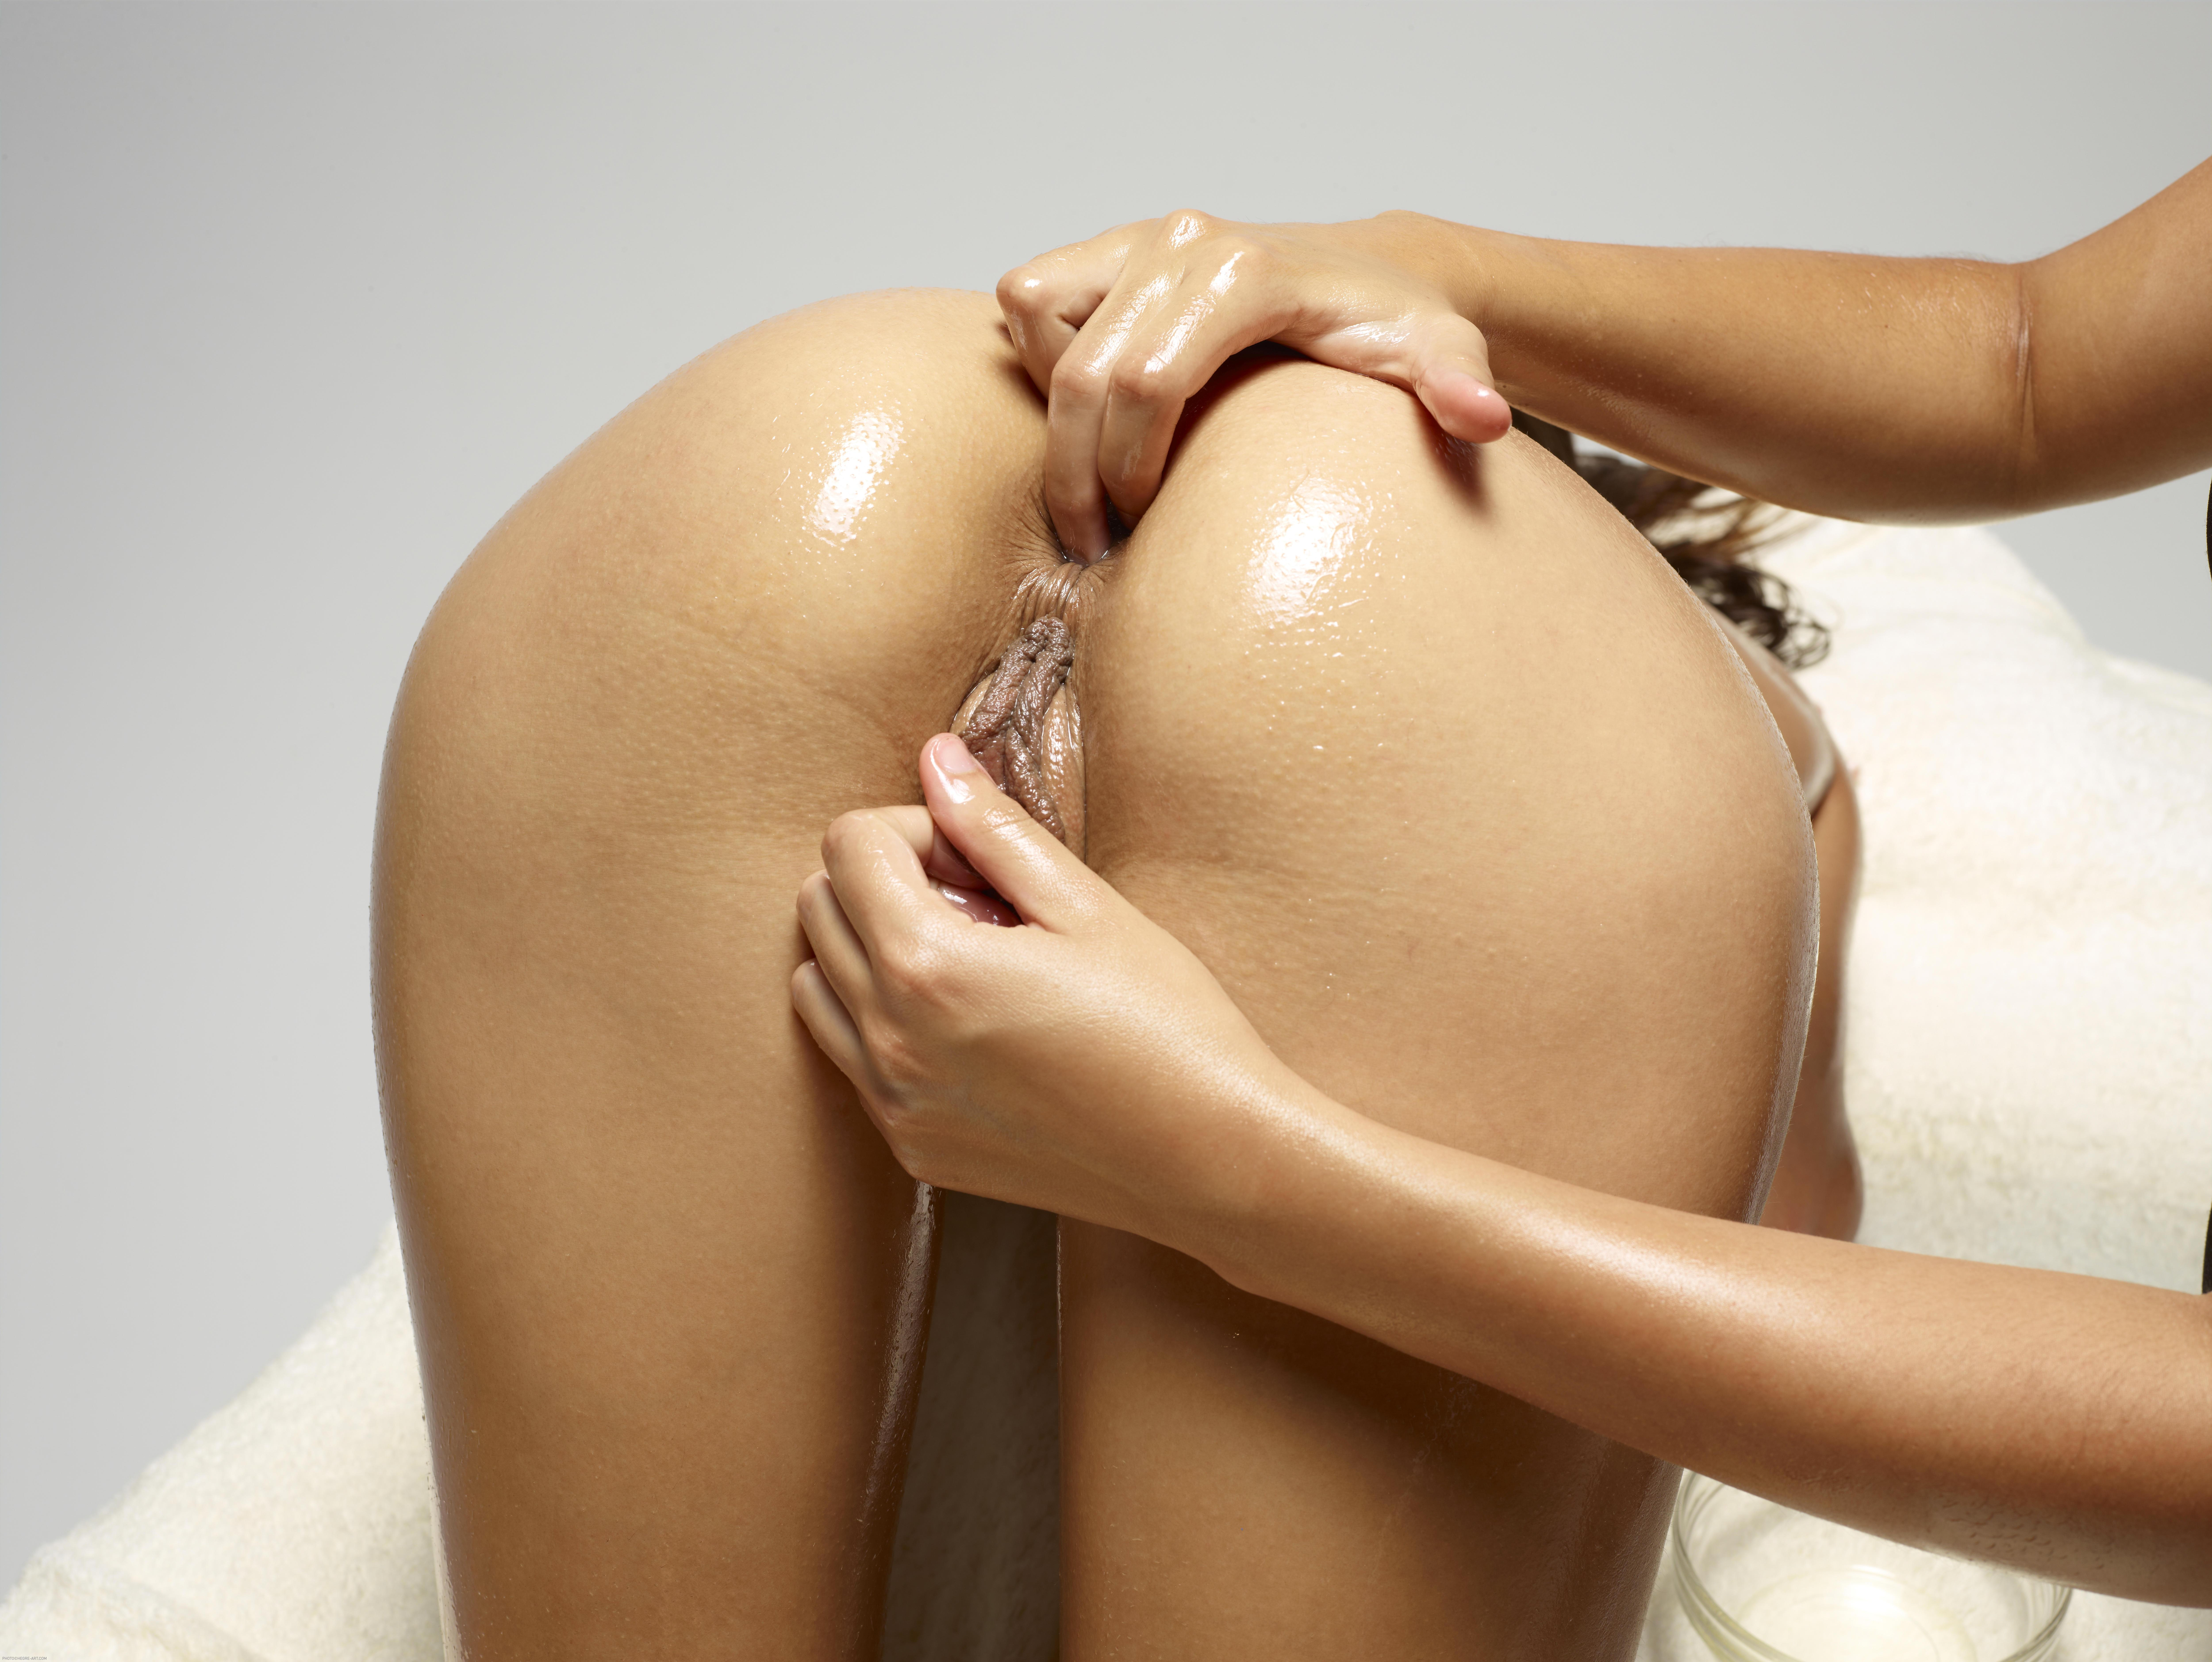 Screaming anal massage